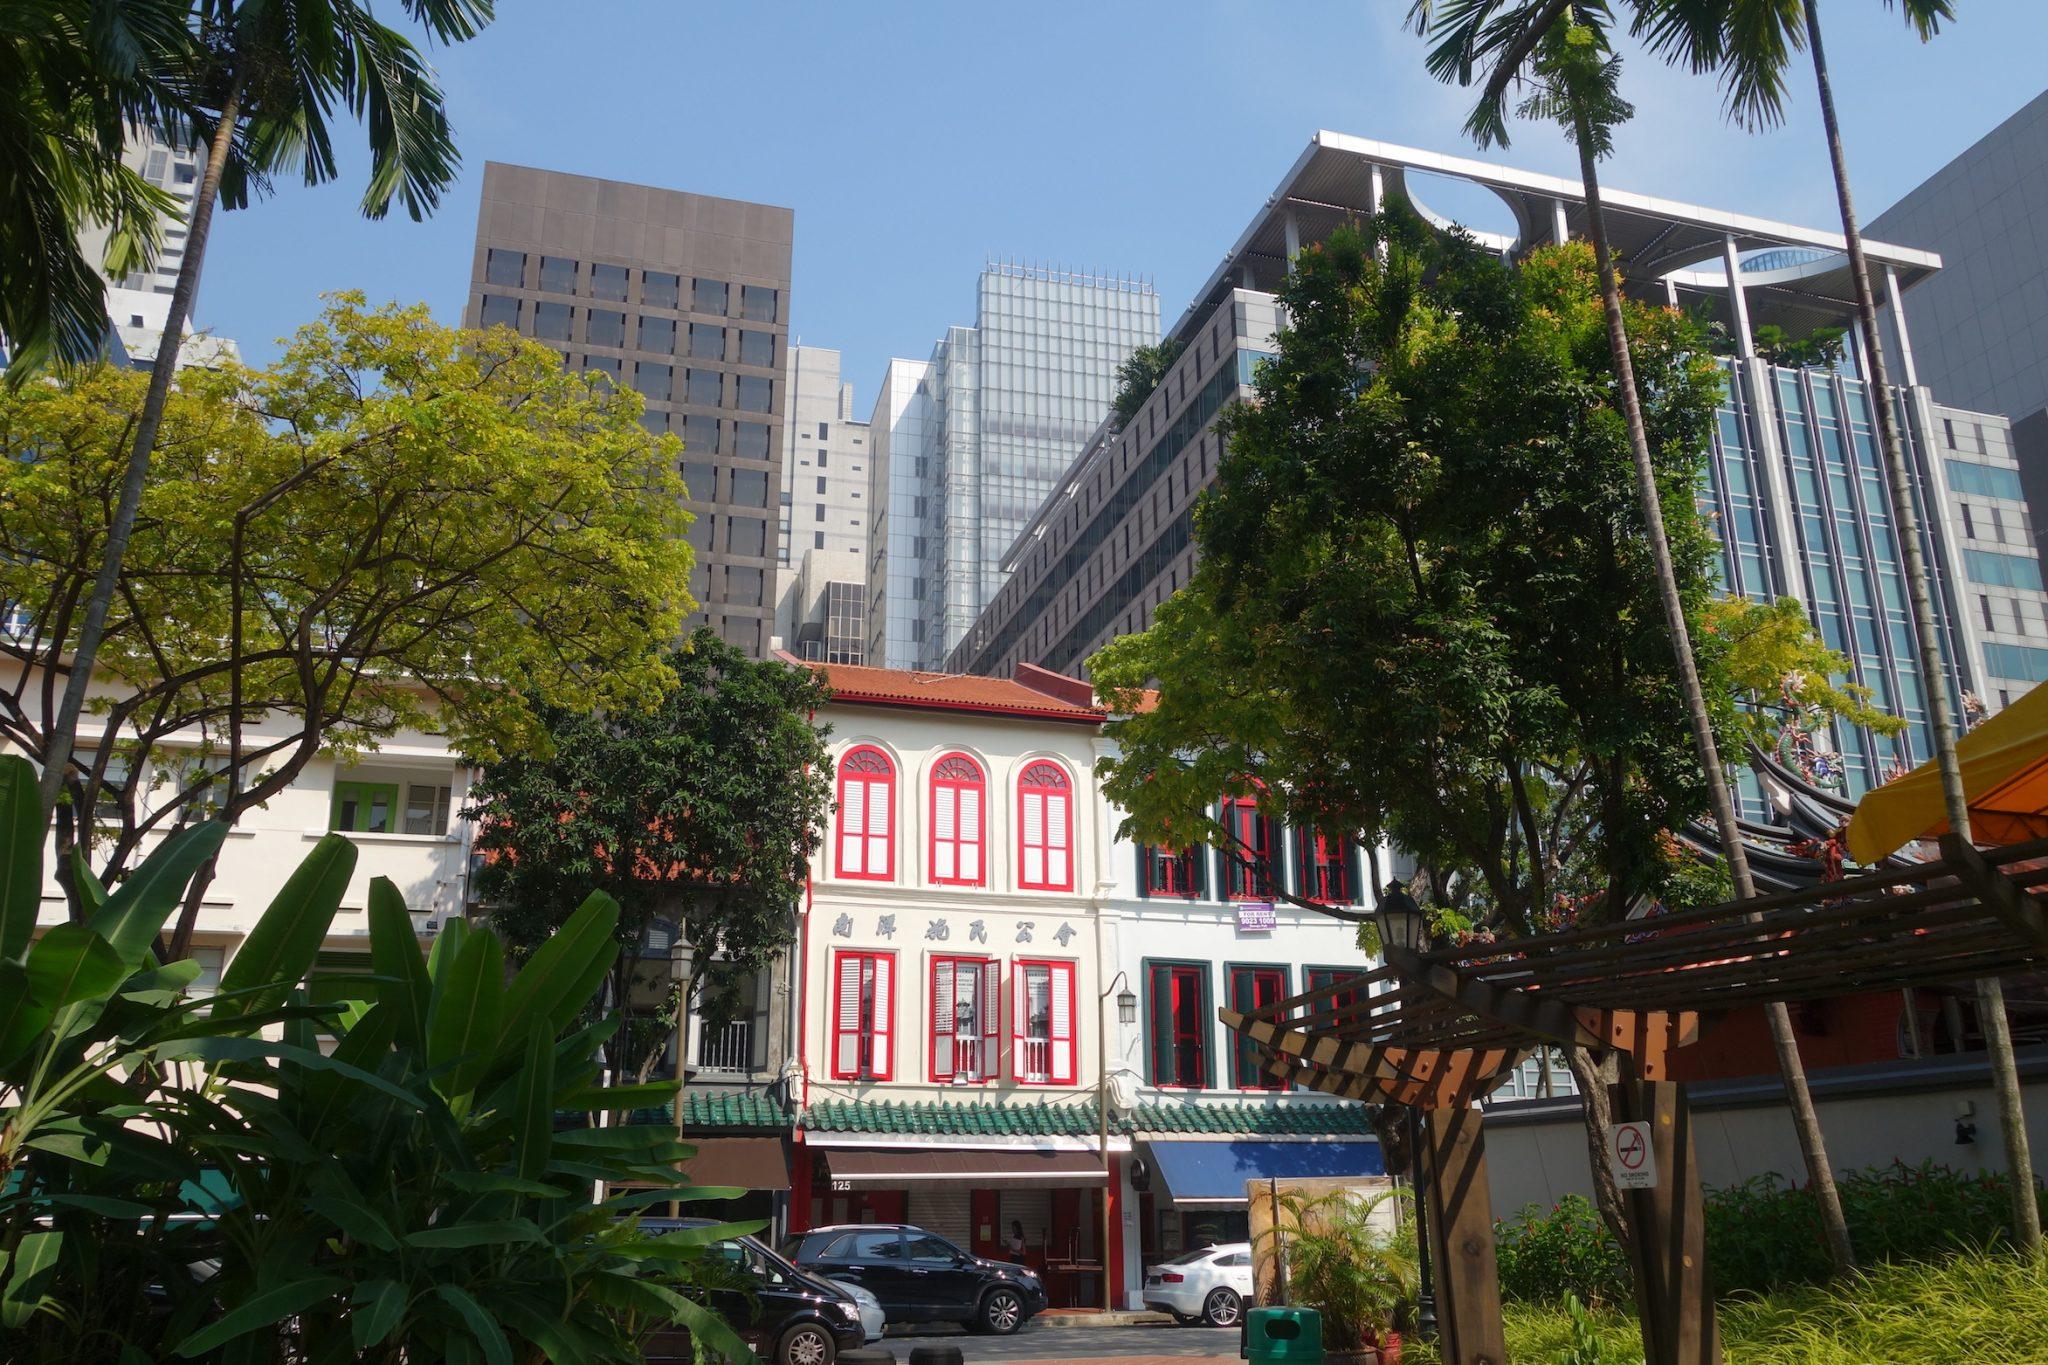 Singapur_TanjongPagar_Chinatown_TelokAyer_Skyline